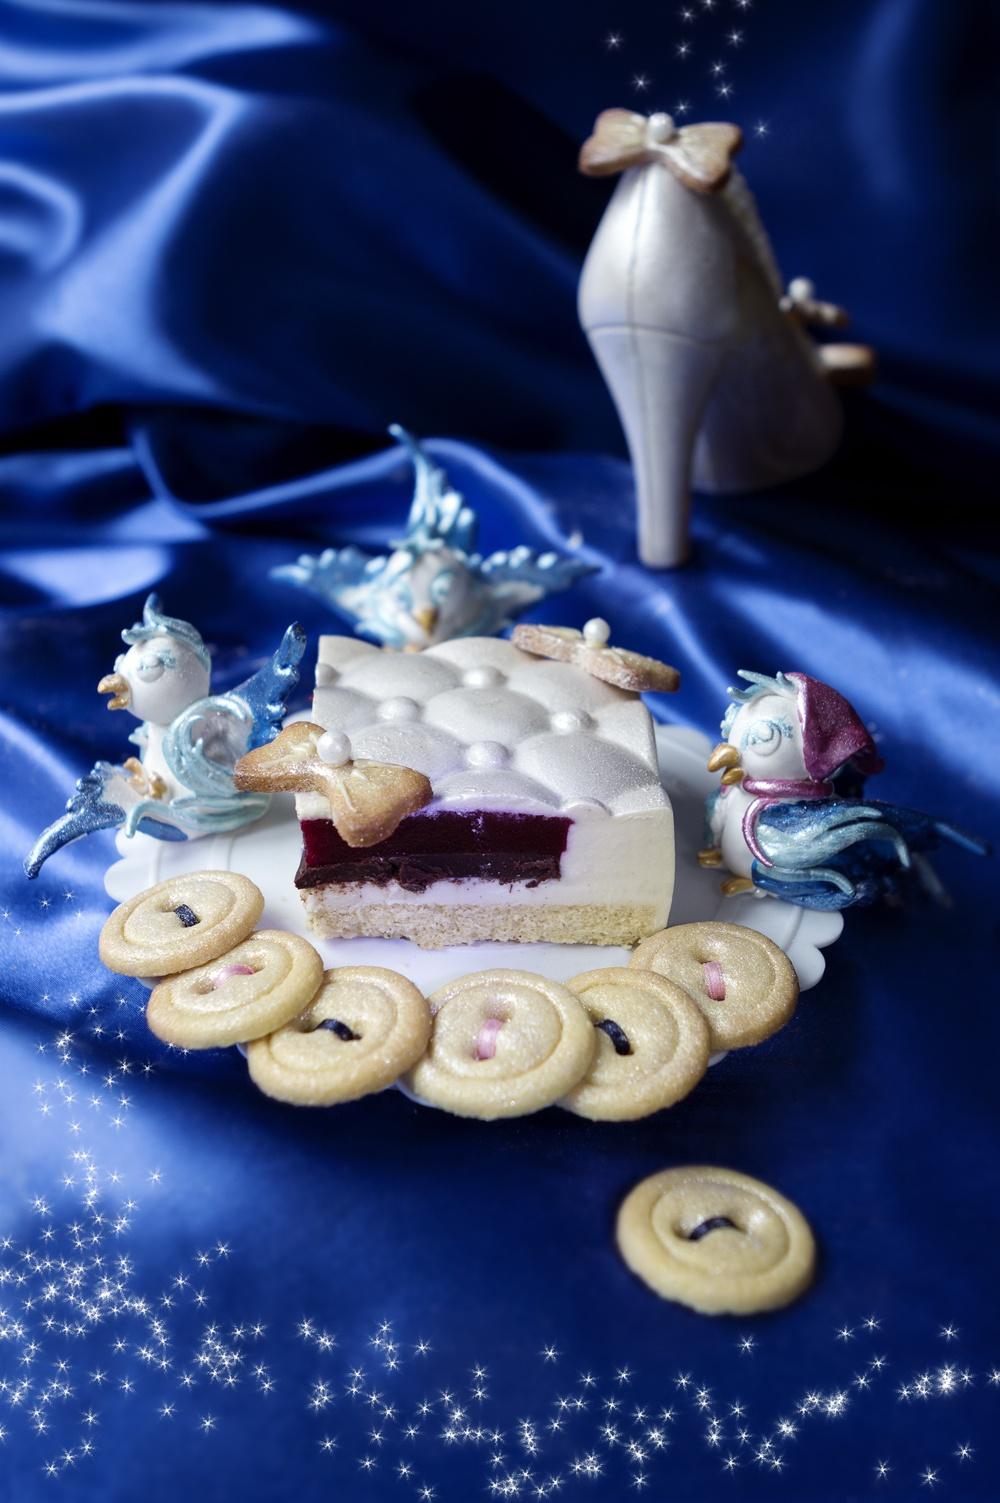 Gâteau Cendrillon - Cinderella cake 1 - studio de création - Qui a volé les tartes